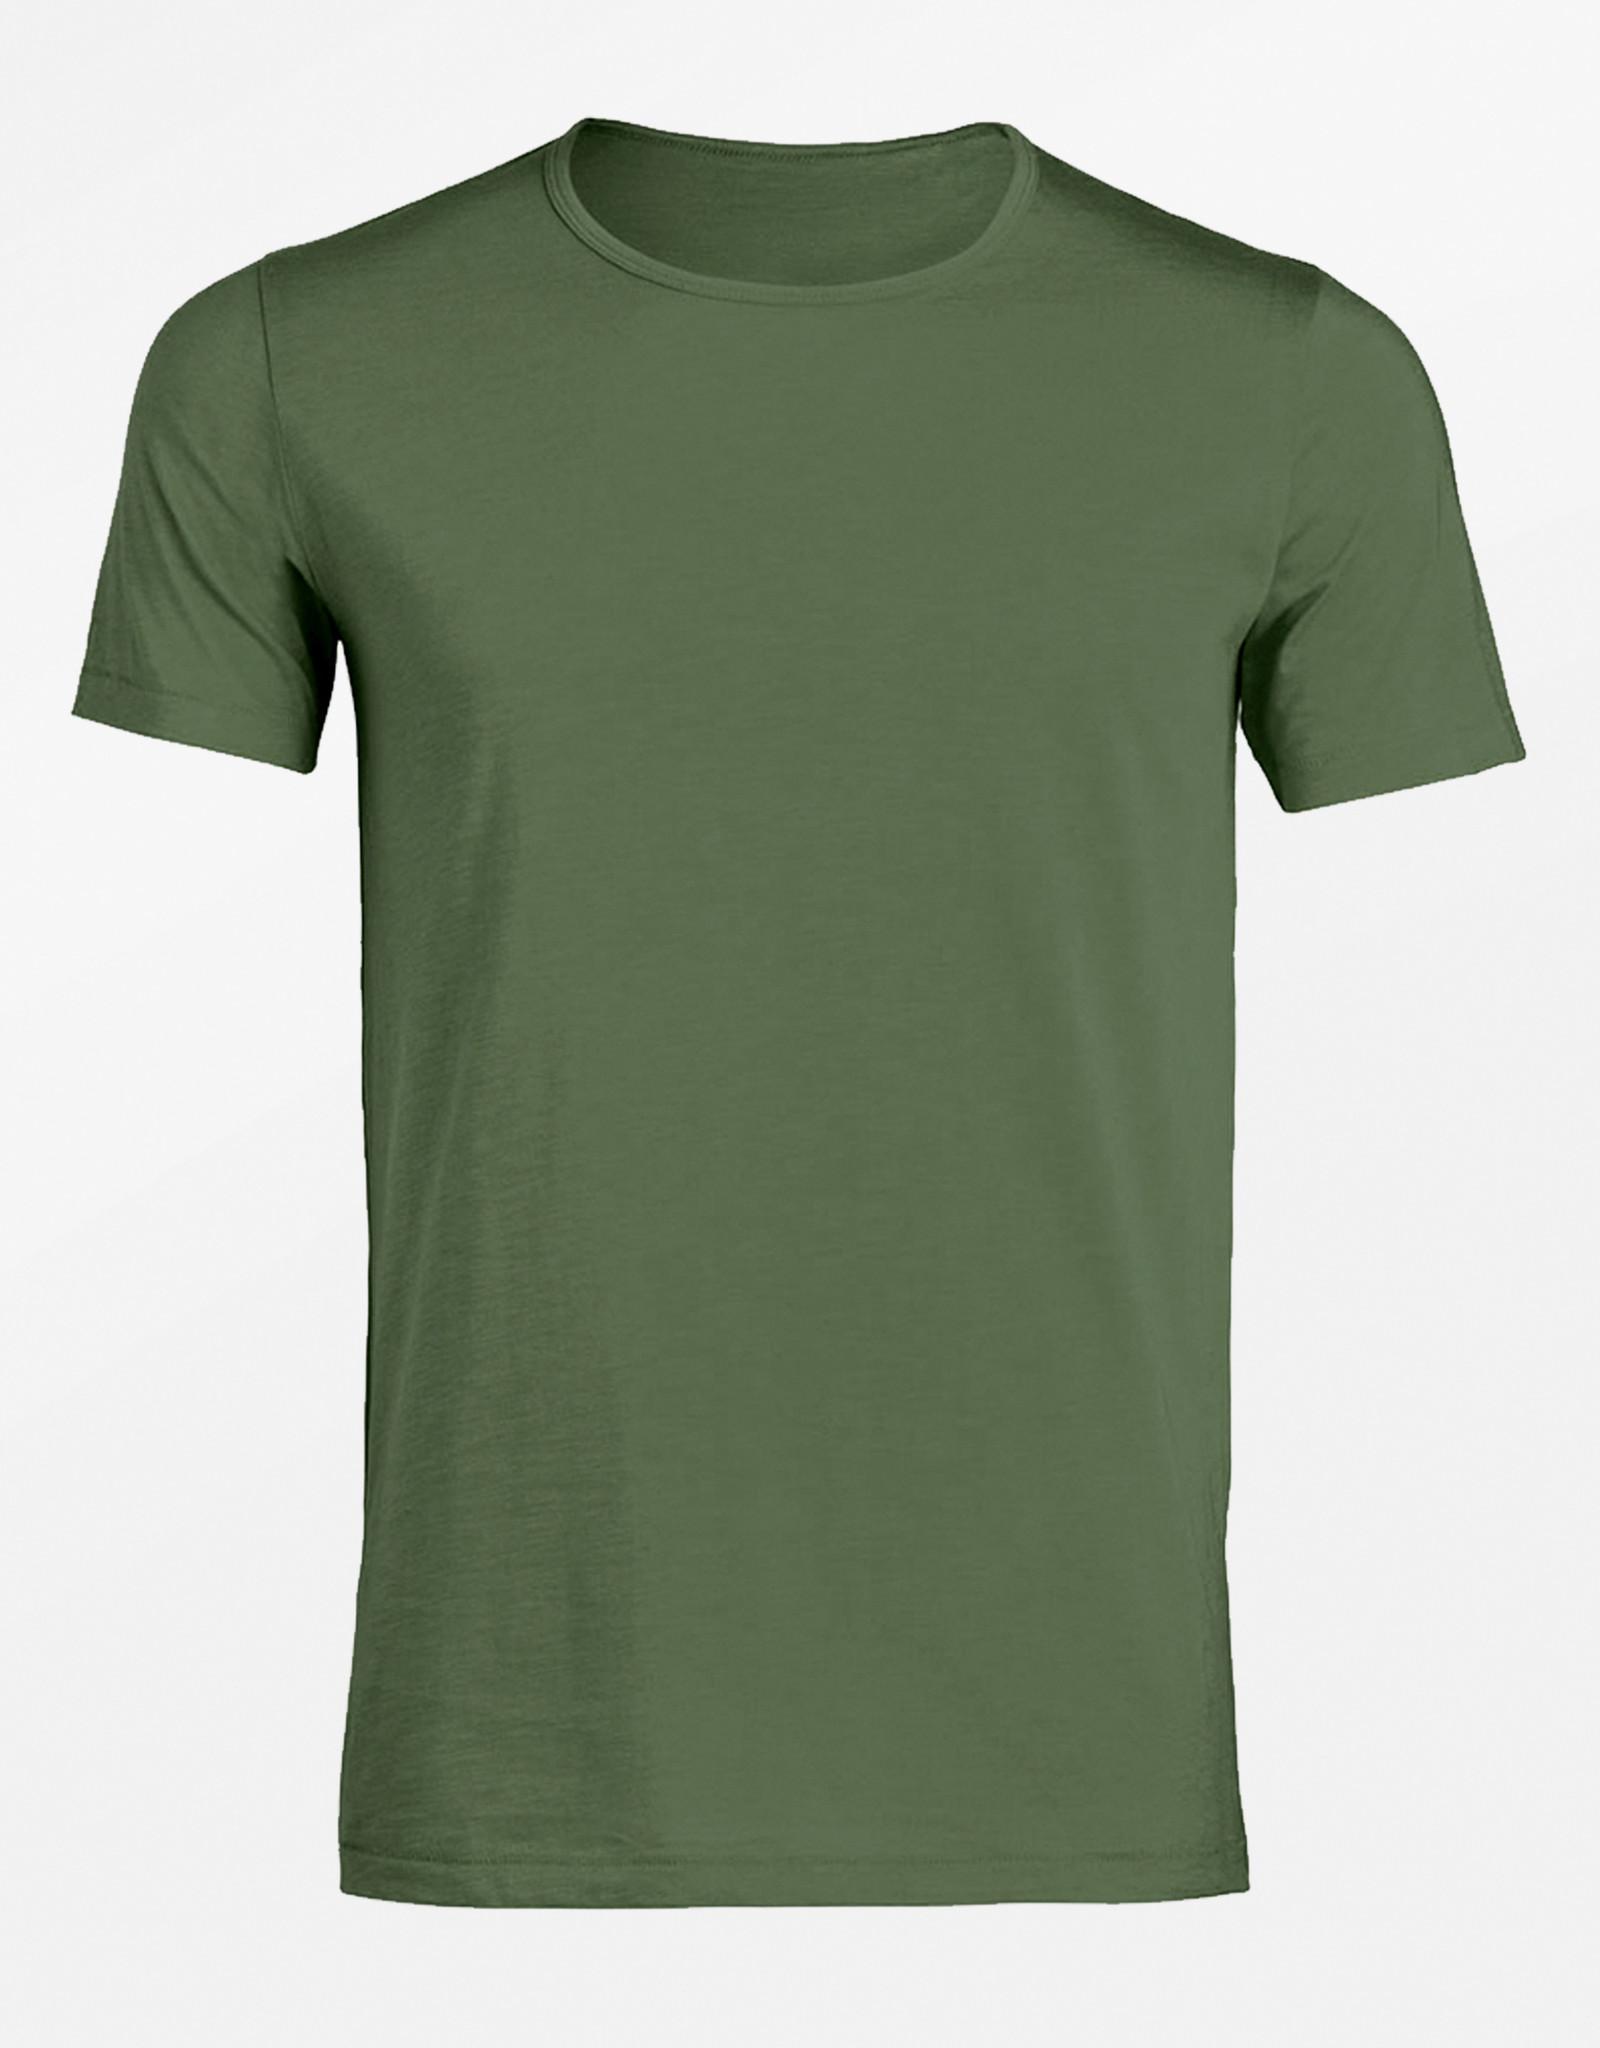 Greenbomb T-SHIRT GREEN